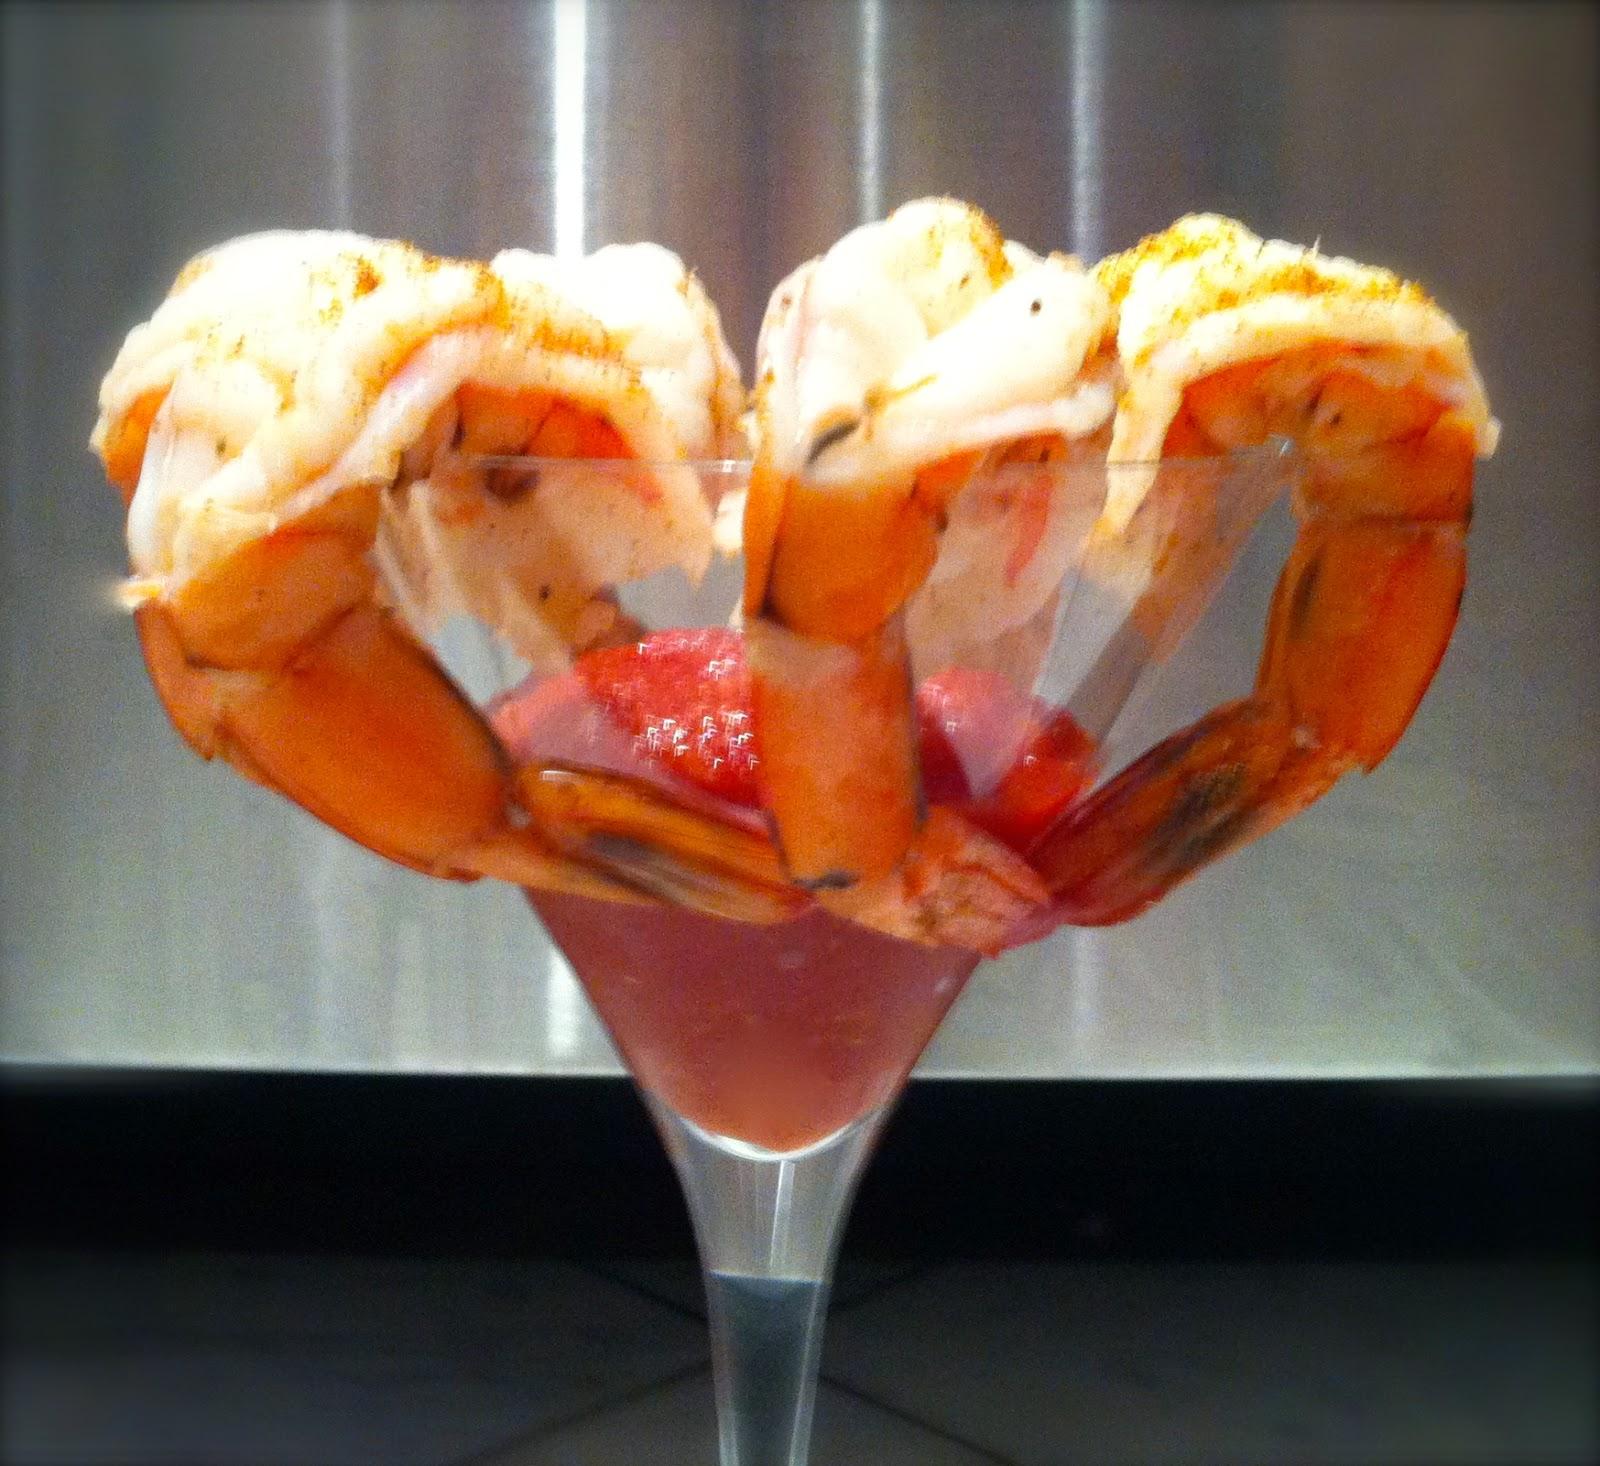 طريقة شريمب كوكتلshrimp cocktail img_0617.jpg